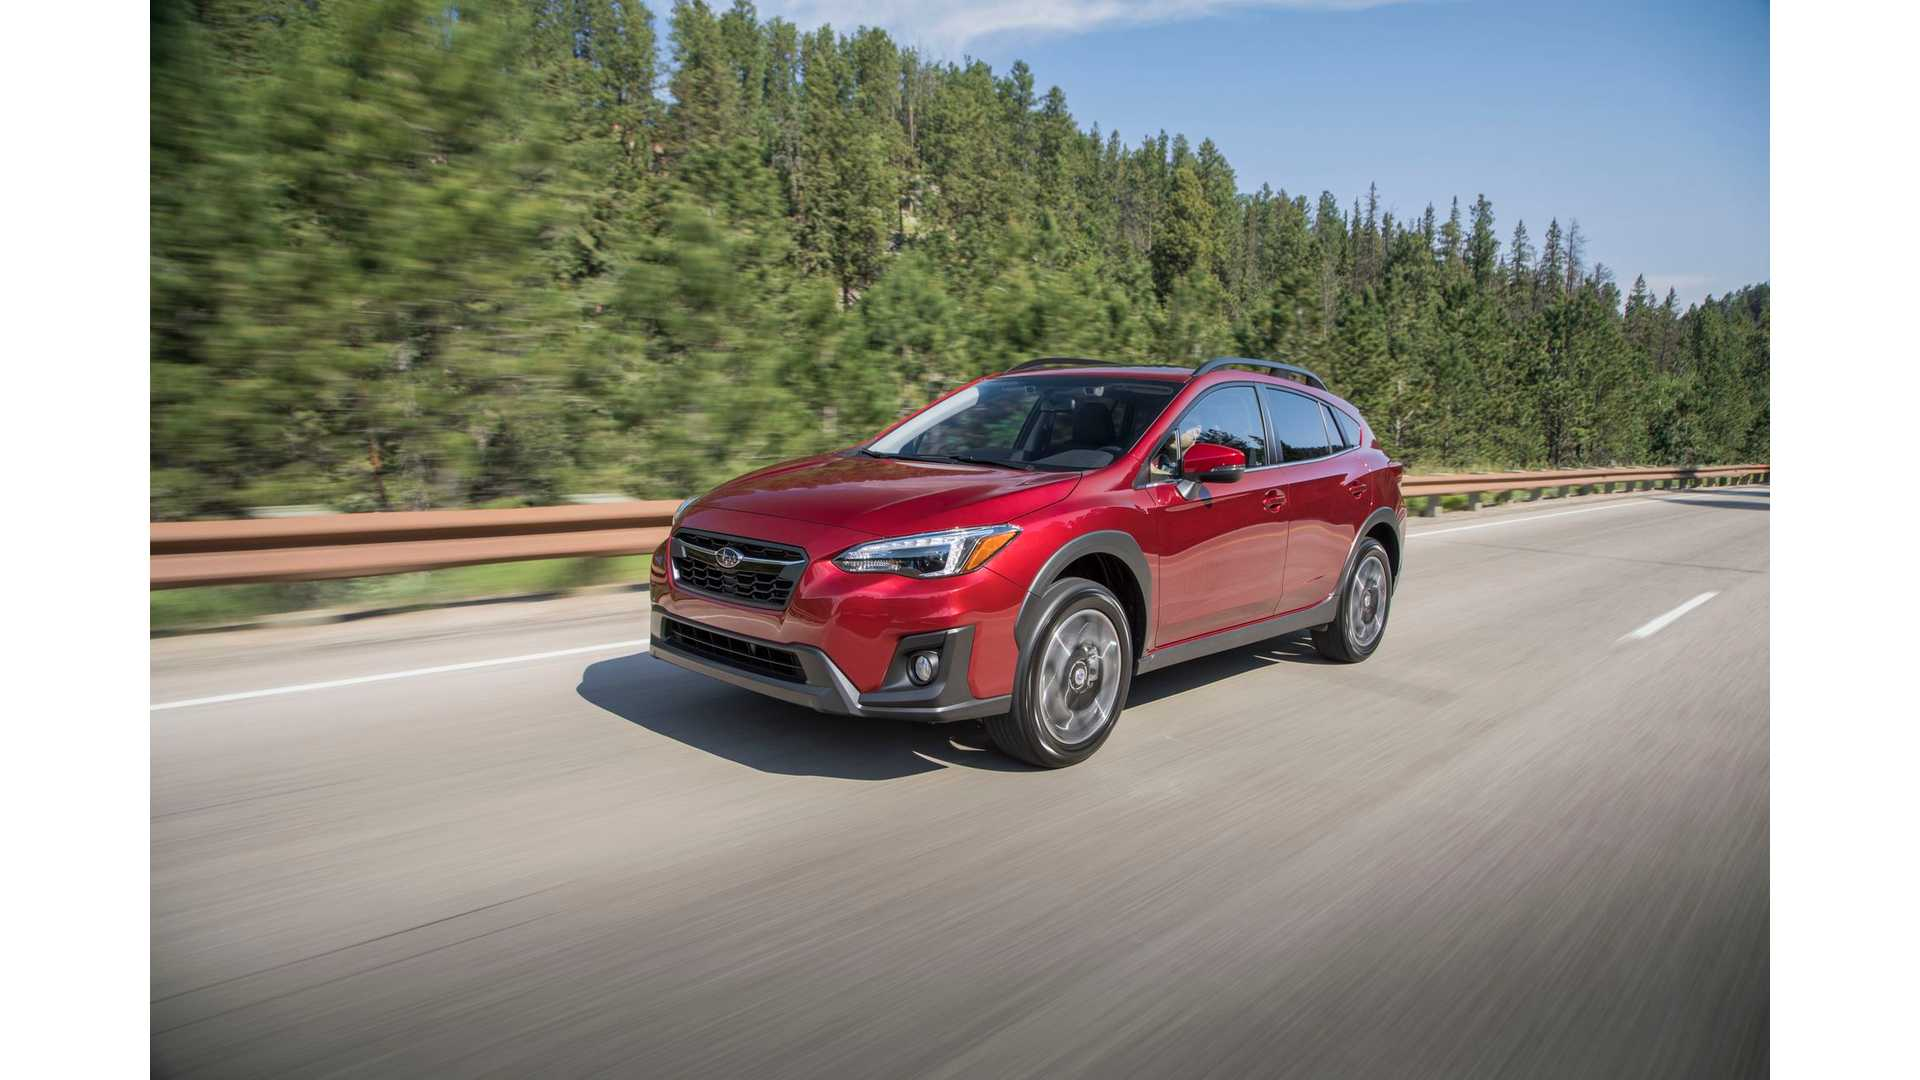 18 All New Subaru 2019 Crosstrek Hybrid Price And Release Date Photos for Subaru 2019 Crosstrek Hybrid Price And Release Date